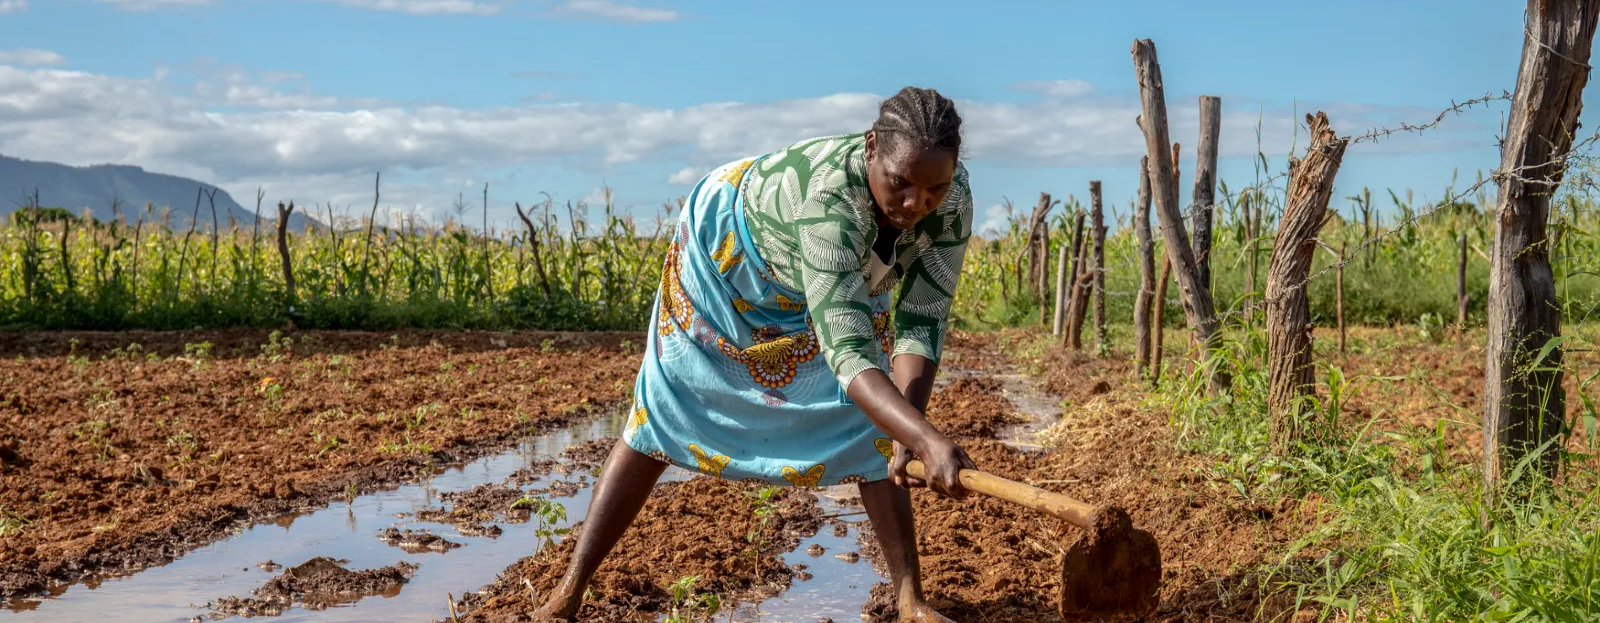 Sarah has been farming for more than 25 years. Photo: Cynthia Matonhodze/Oxfam